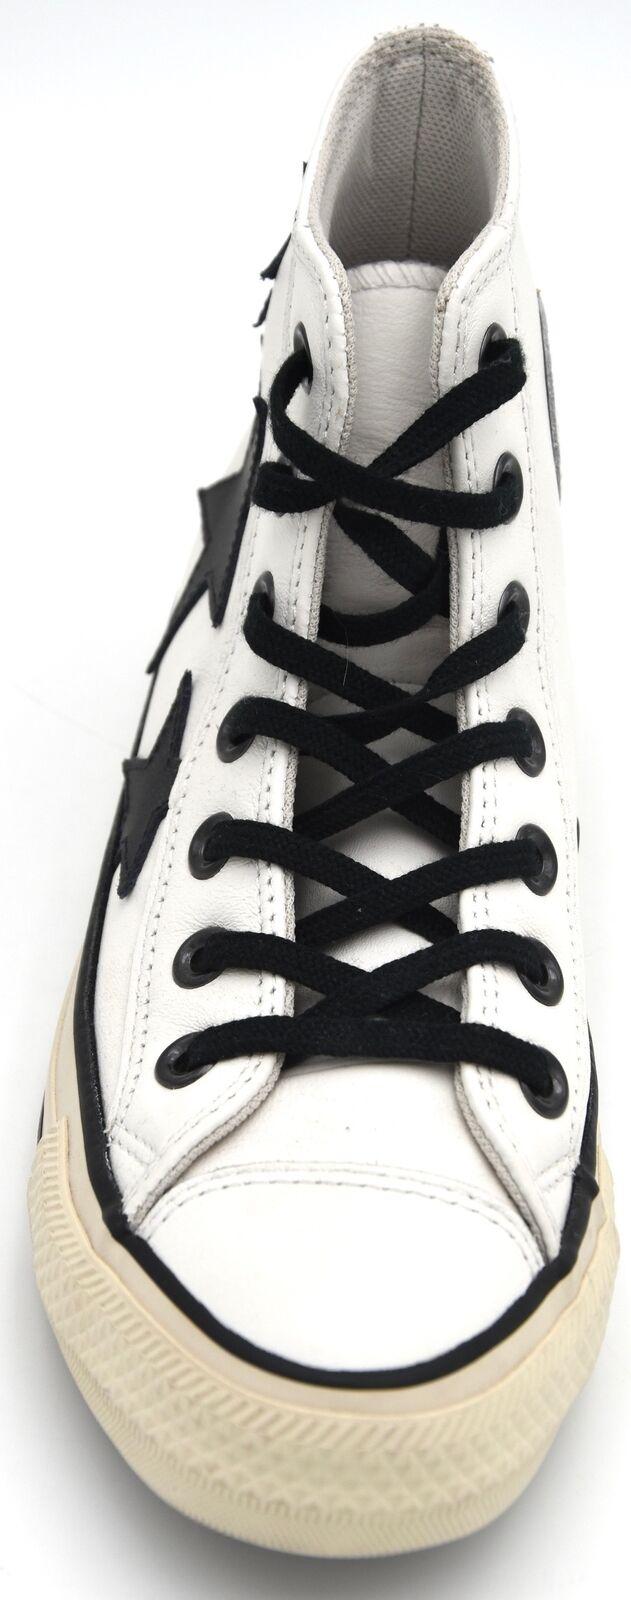 CONVERSE ALL STAR STAR STAR WOMAN MAN UNISEX baskets chaussures 158912C CTAS CURVED EYESTAY HI 02b4dd